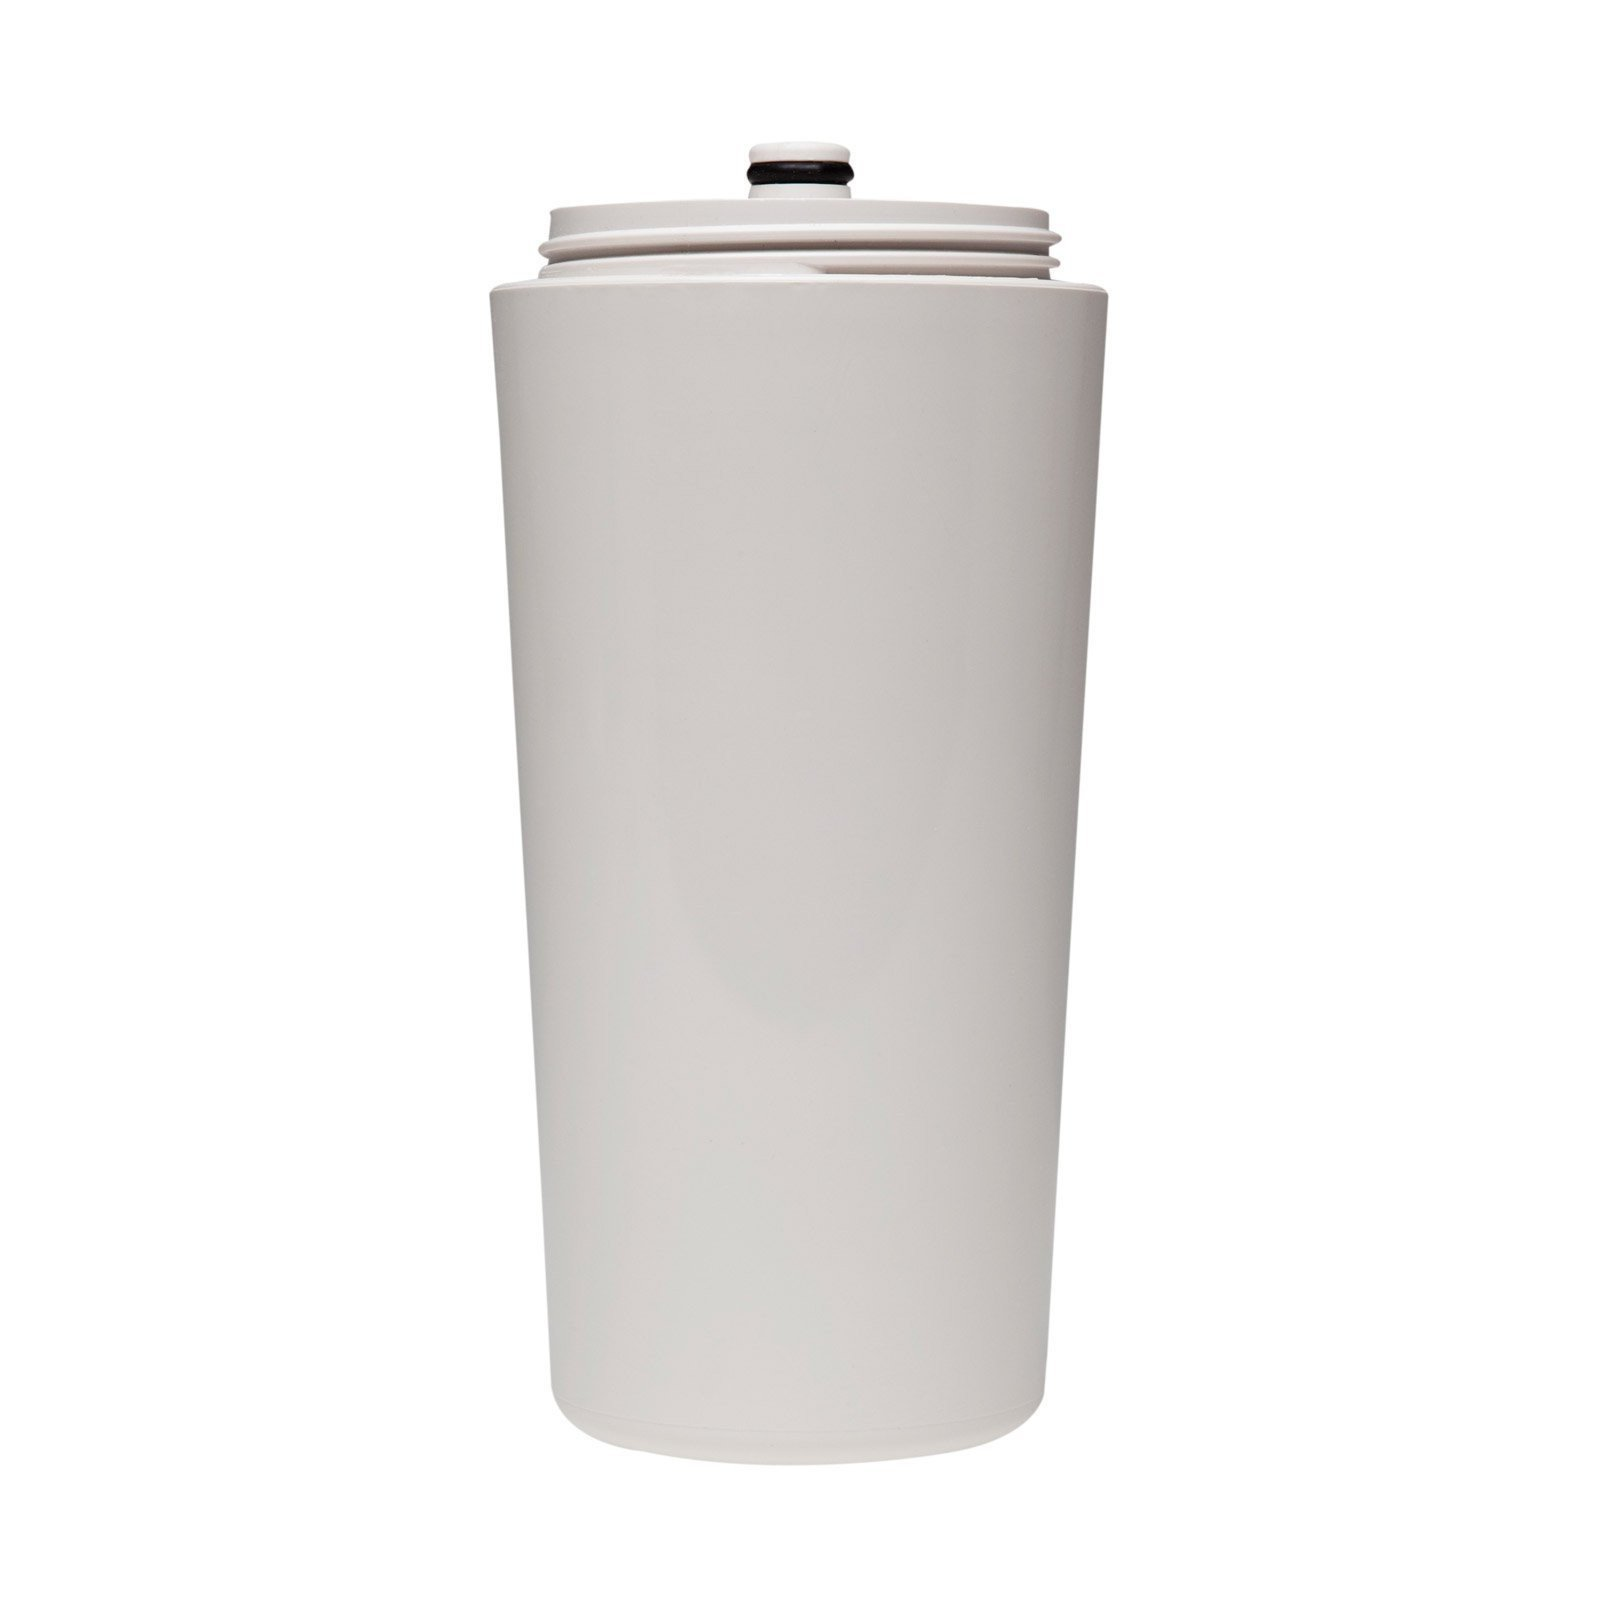 aquasana shower water filter. Black Bedroom Furniture Sets. Home Design Ideas